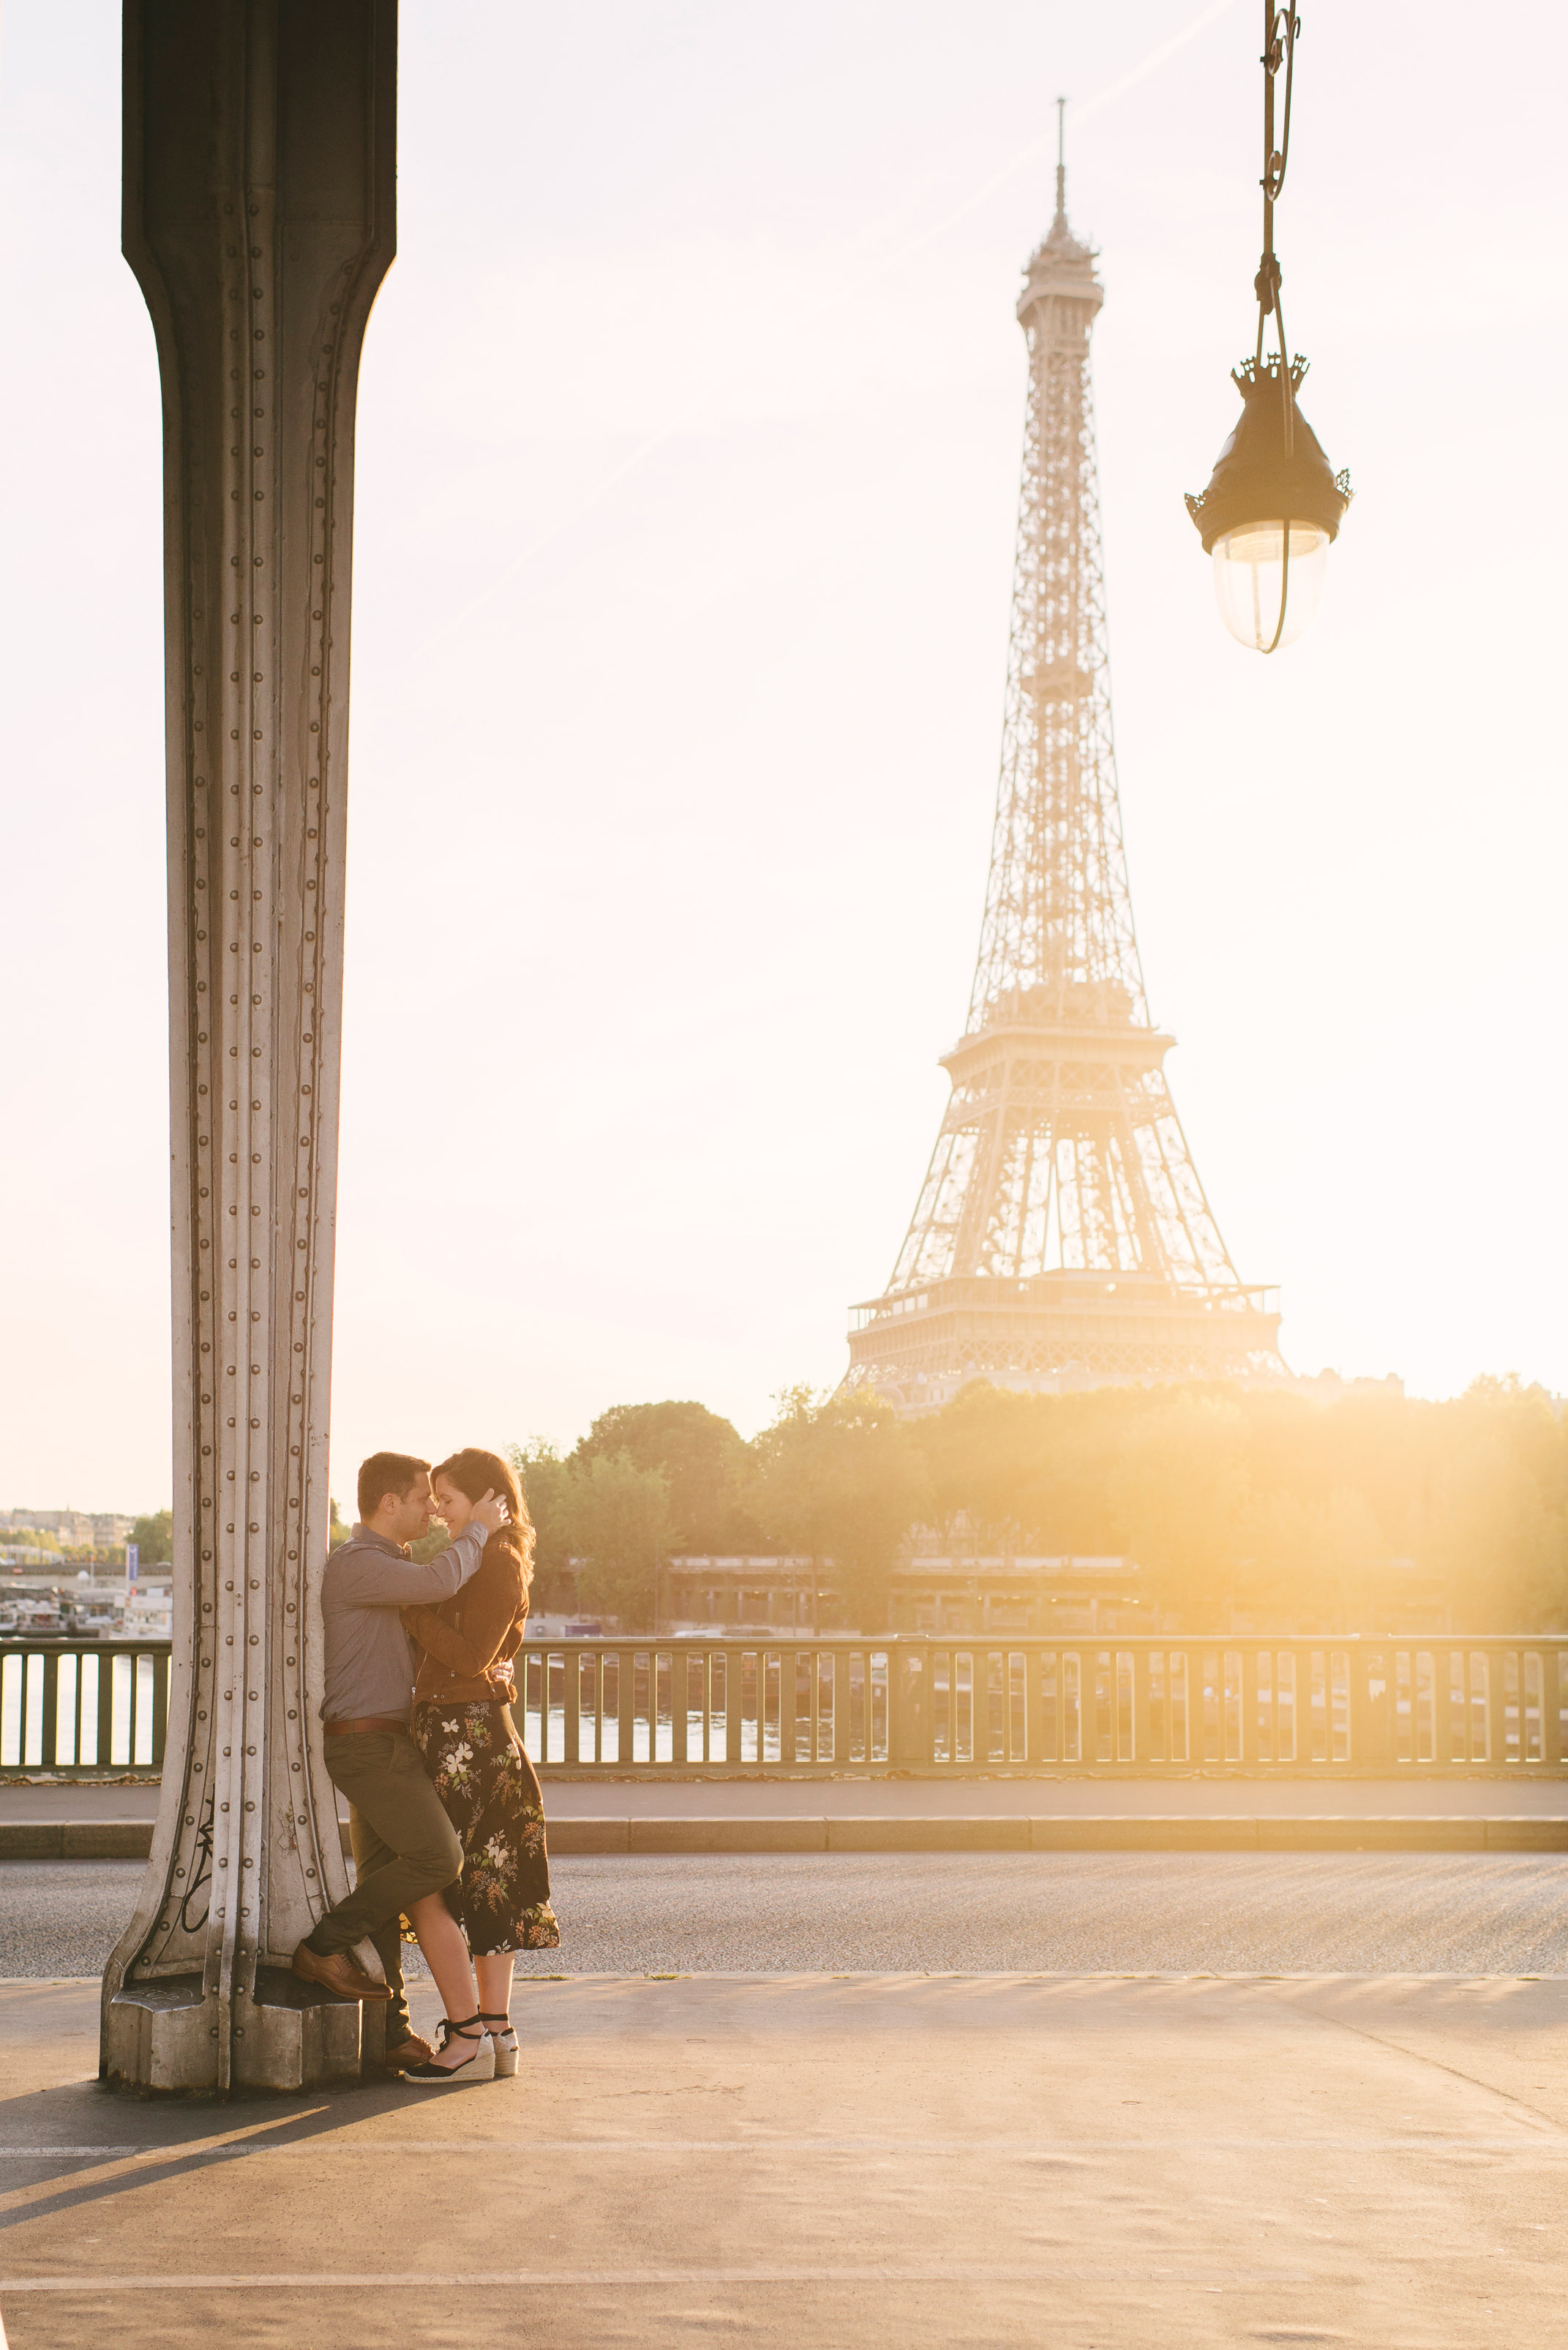 Couple-Portrait-Session-Paris-France-EiffelTower-BirHakiem-ChampsdeMars-cafe024.jpg